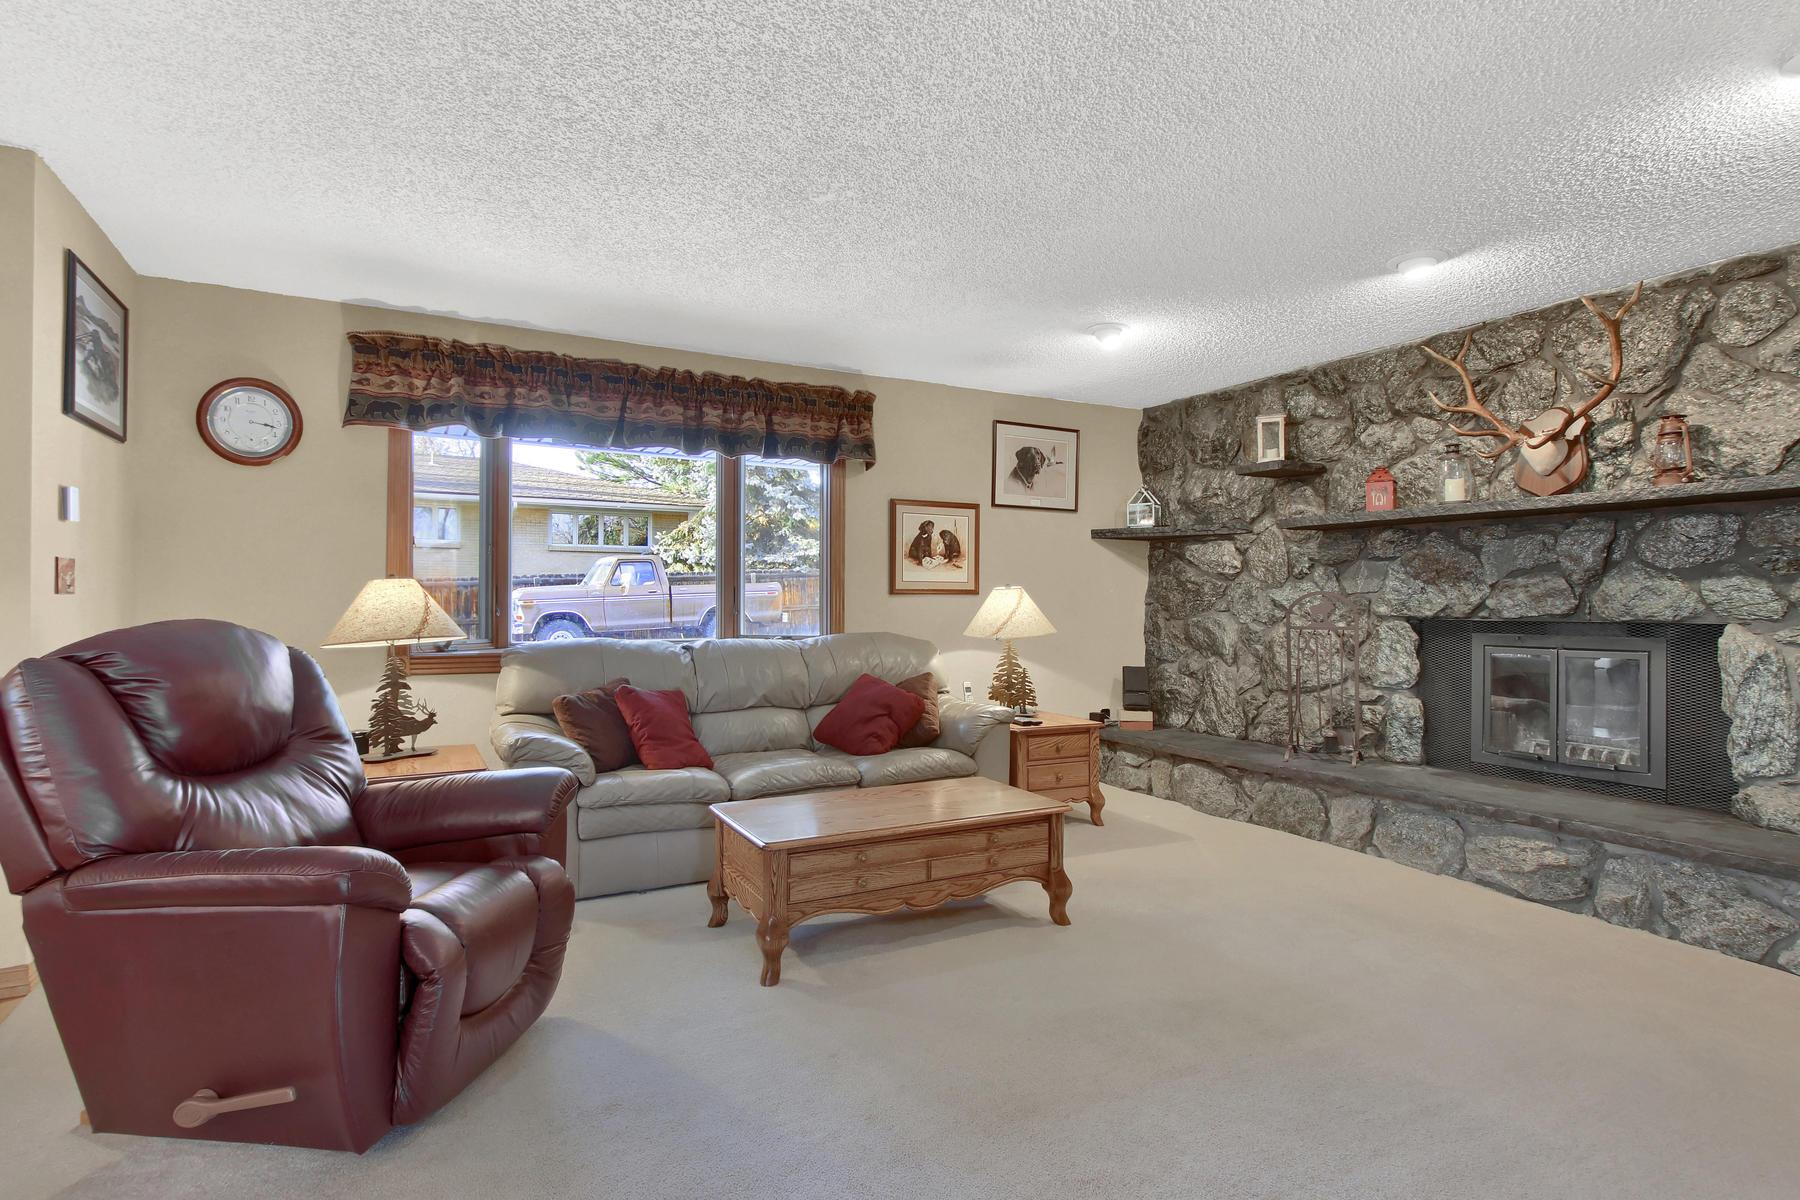 11415 W 76th Way Arvada CO-023-16-Living Room-MLS_Size.jpg